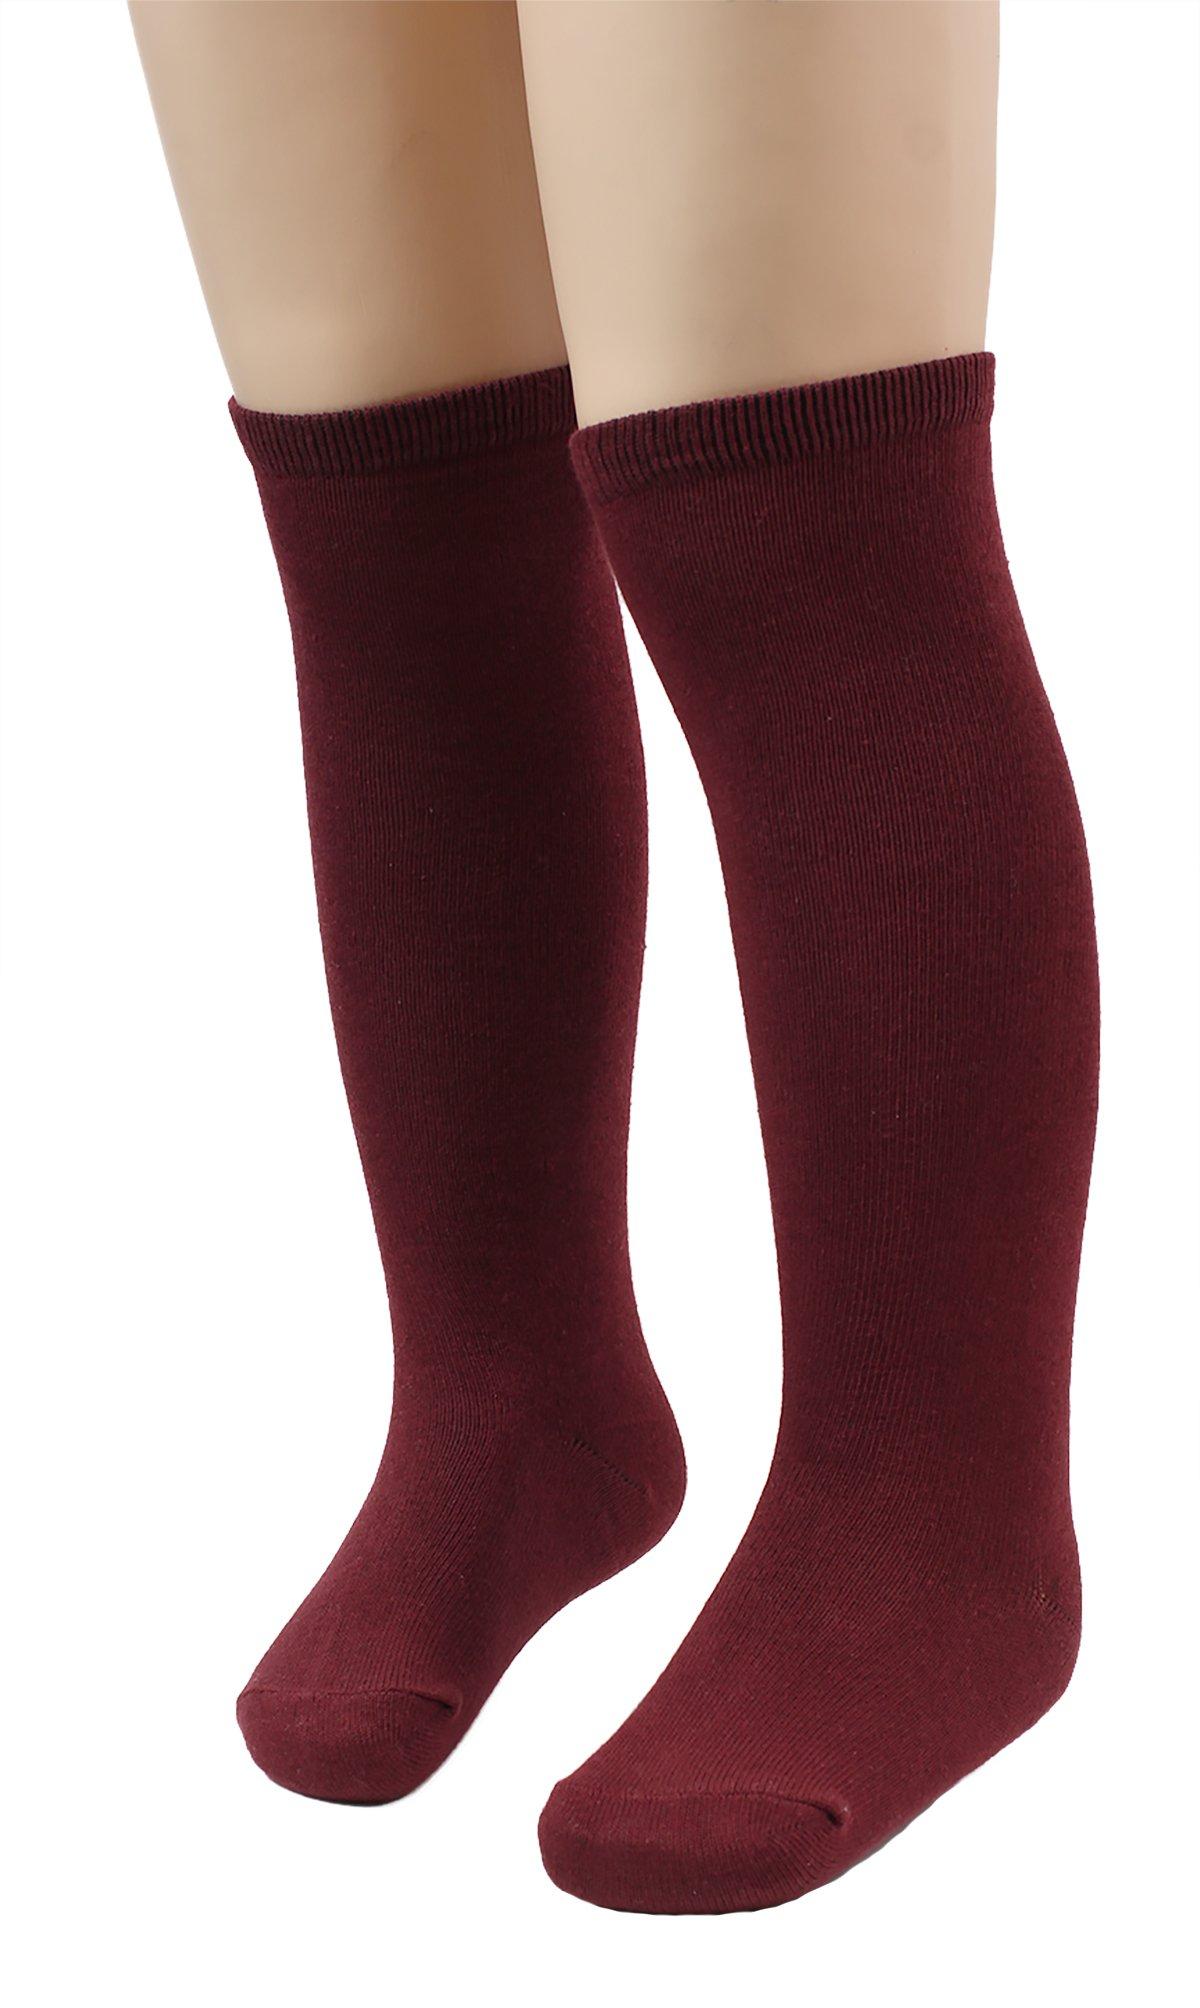 Girls' School Uniform Knee High socks (Pack of 6) (Small, Burgundy)